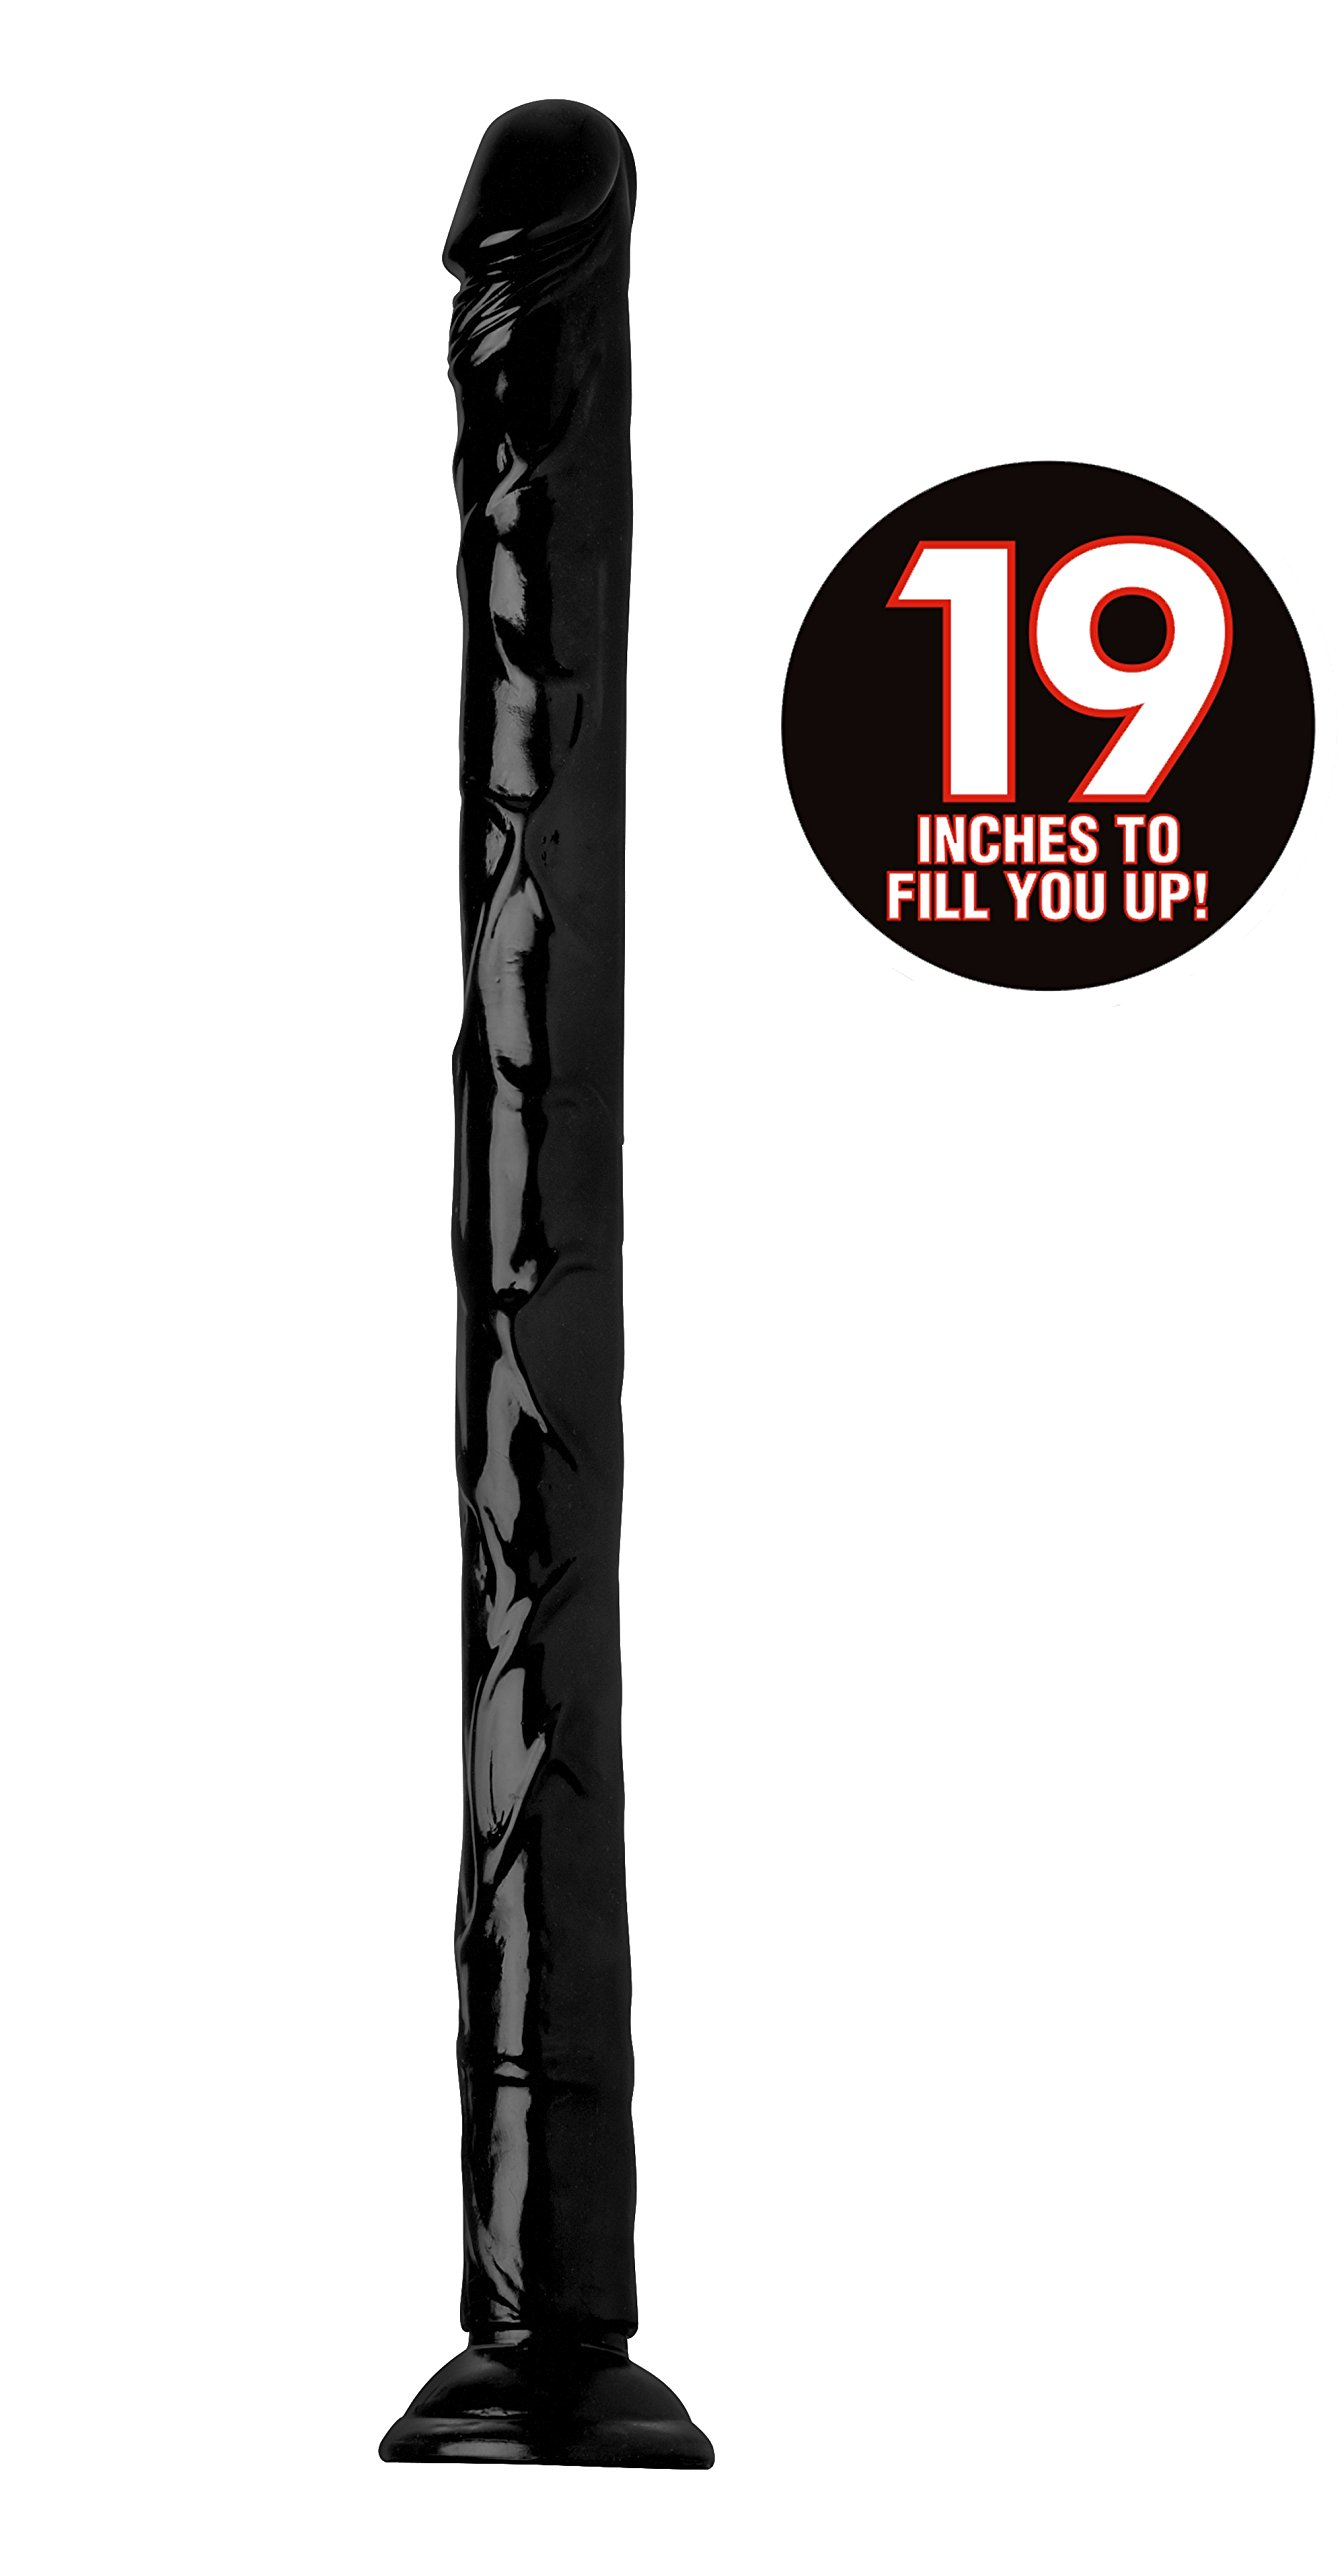 Hosed 19 Inch Realistic Unisex Anal Snake Dildo